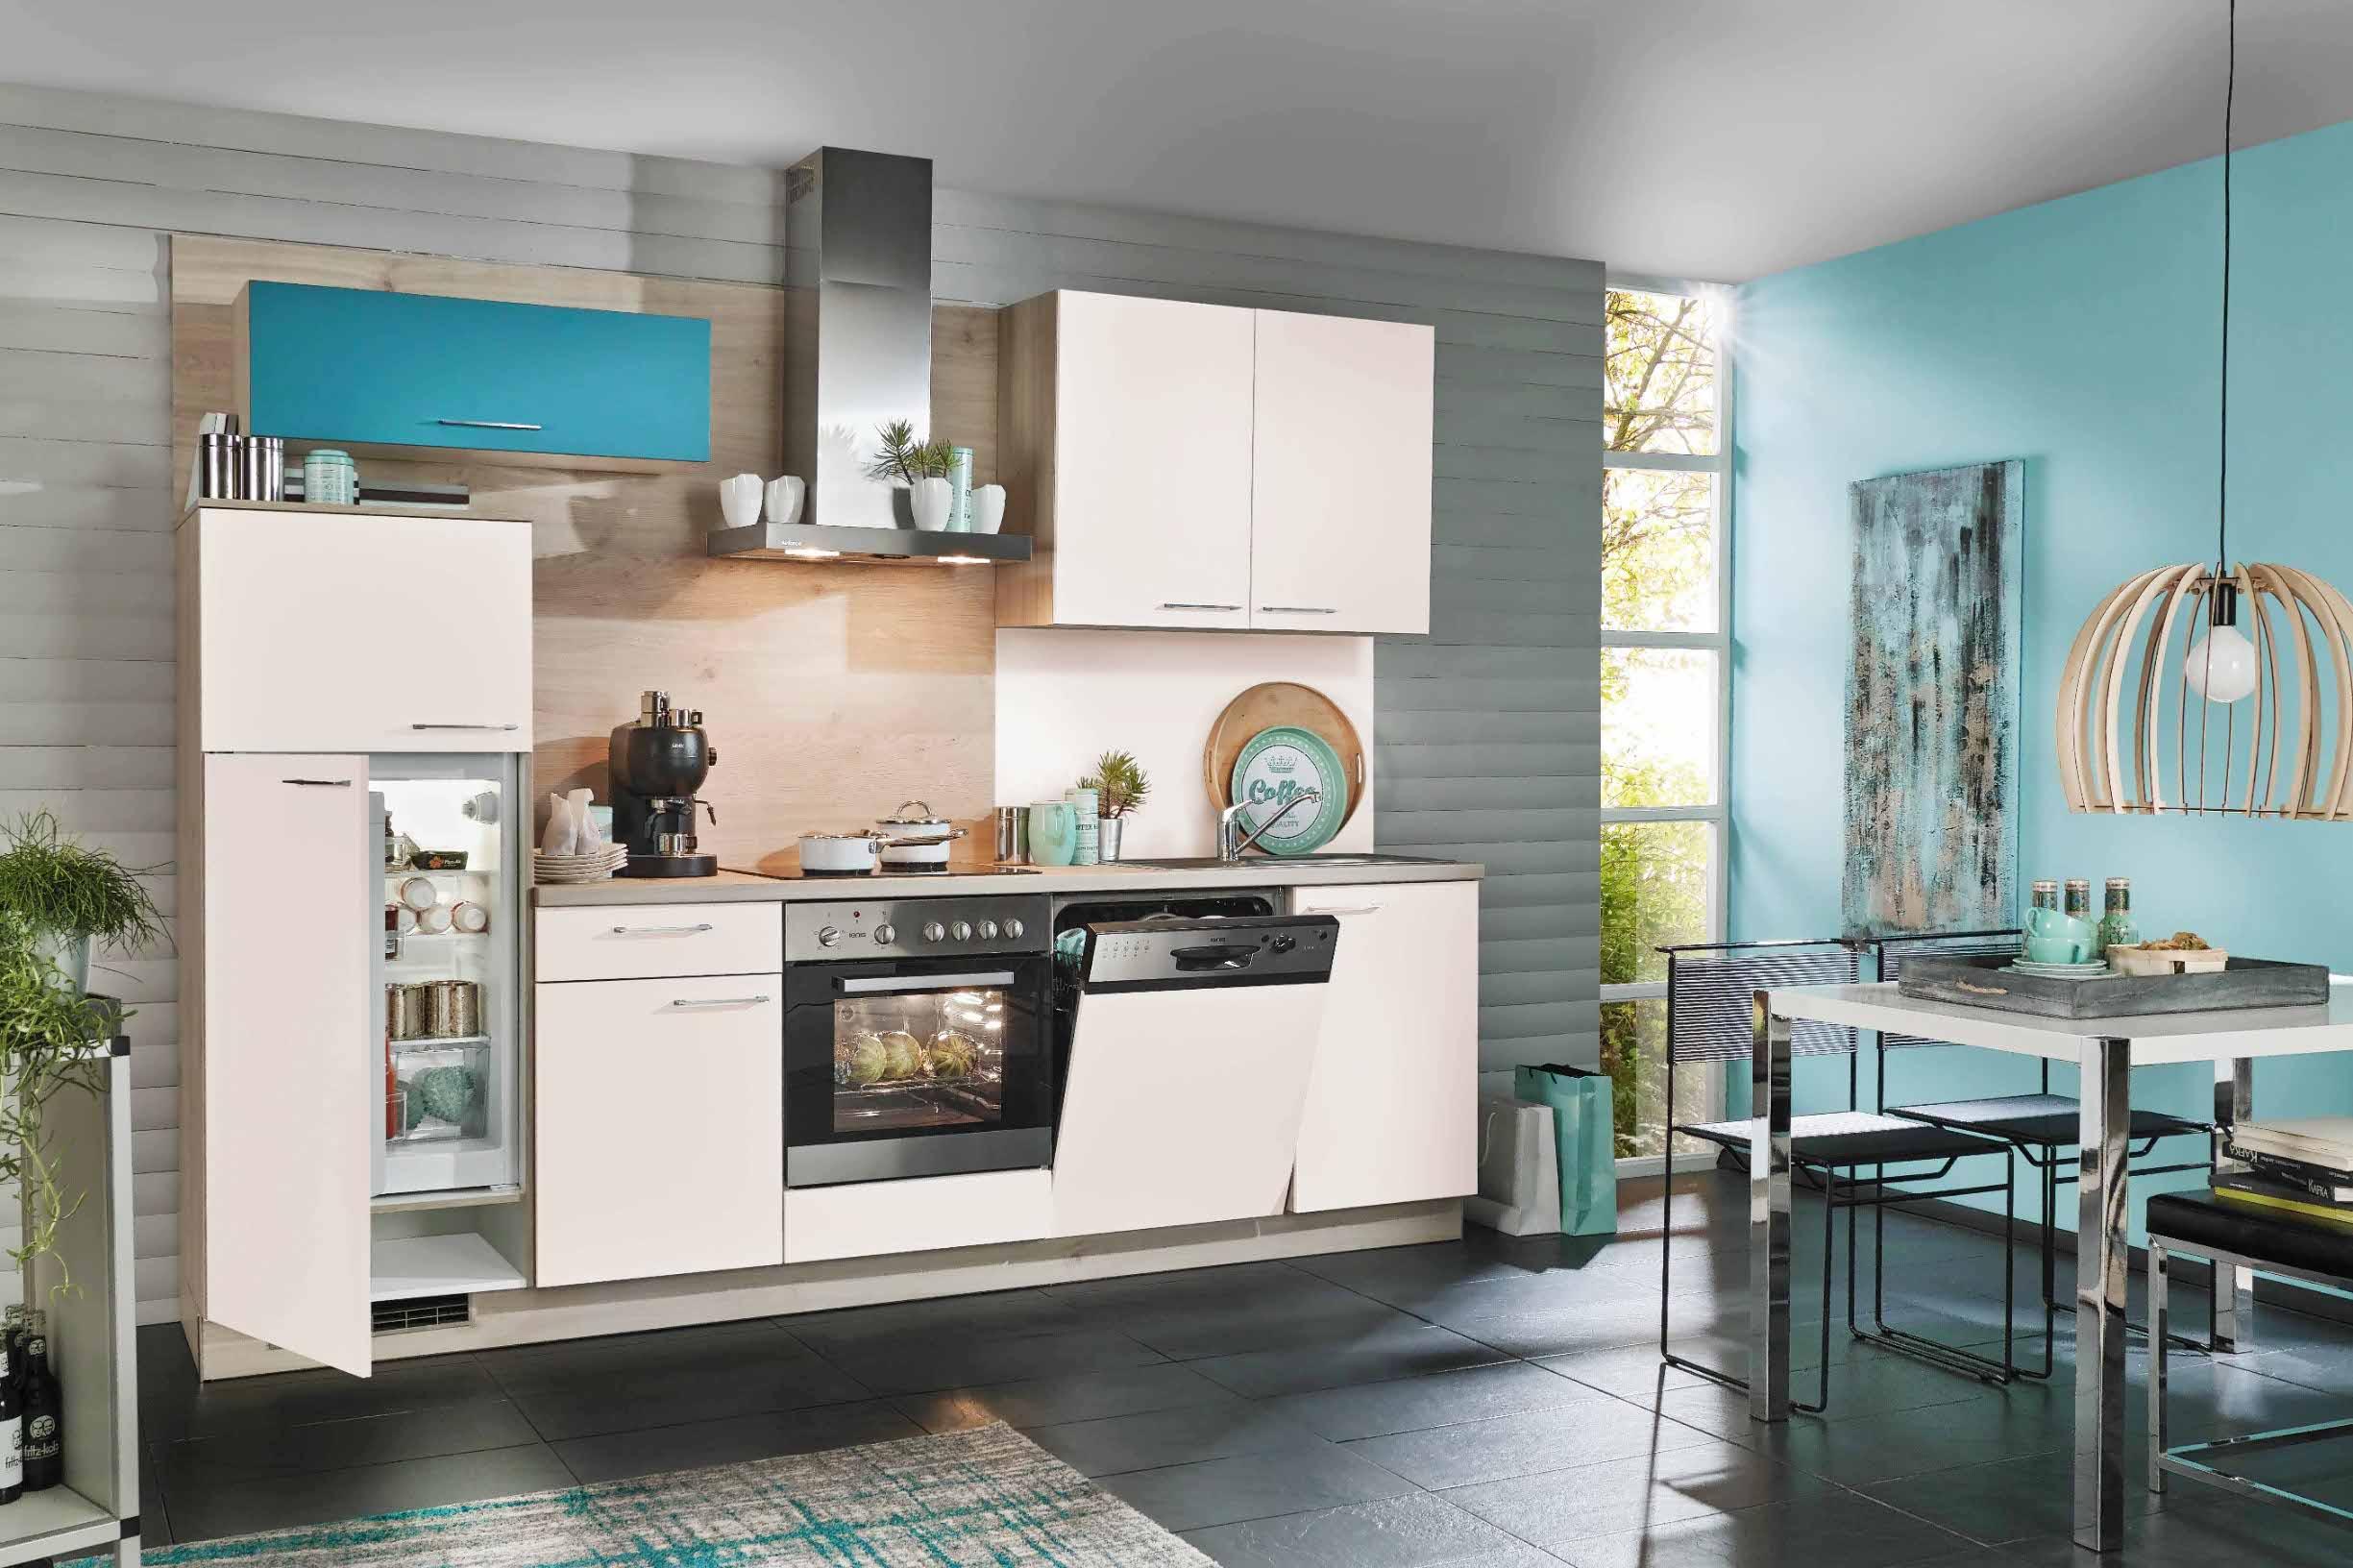 Kuhinjski blok s aparatima, mpc 13. 663,65 kn, 18710121-83